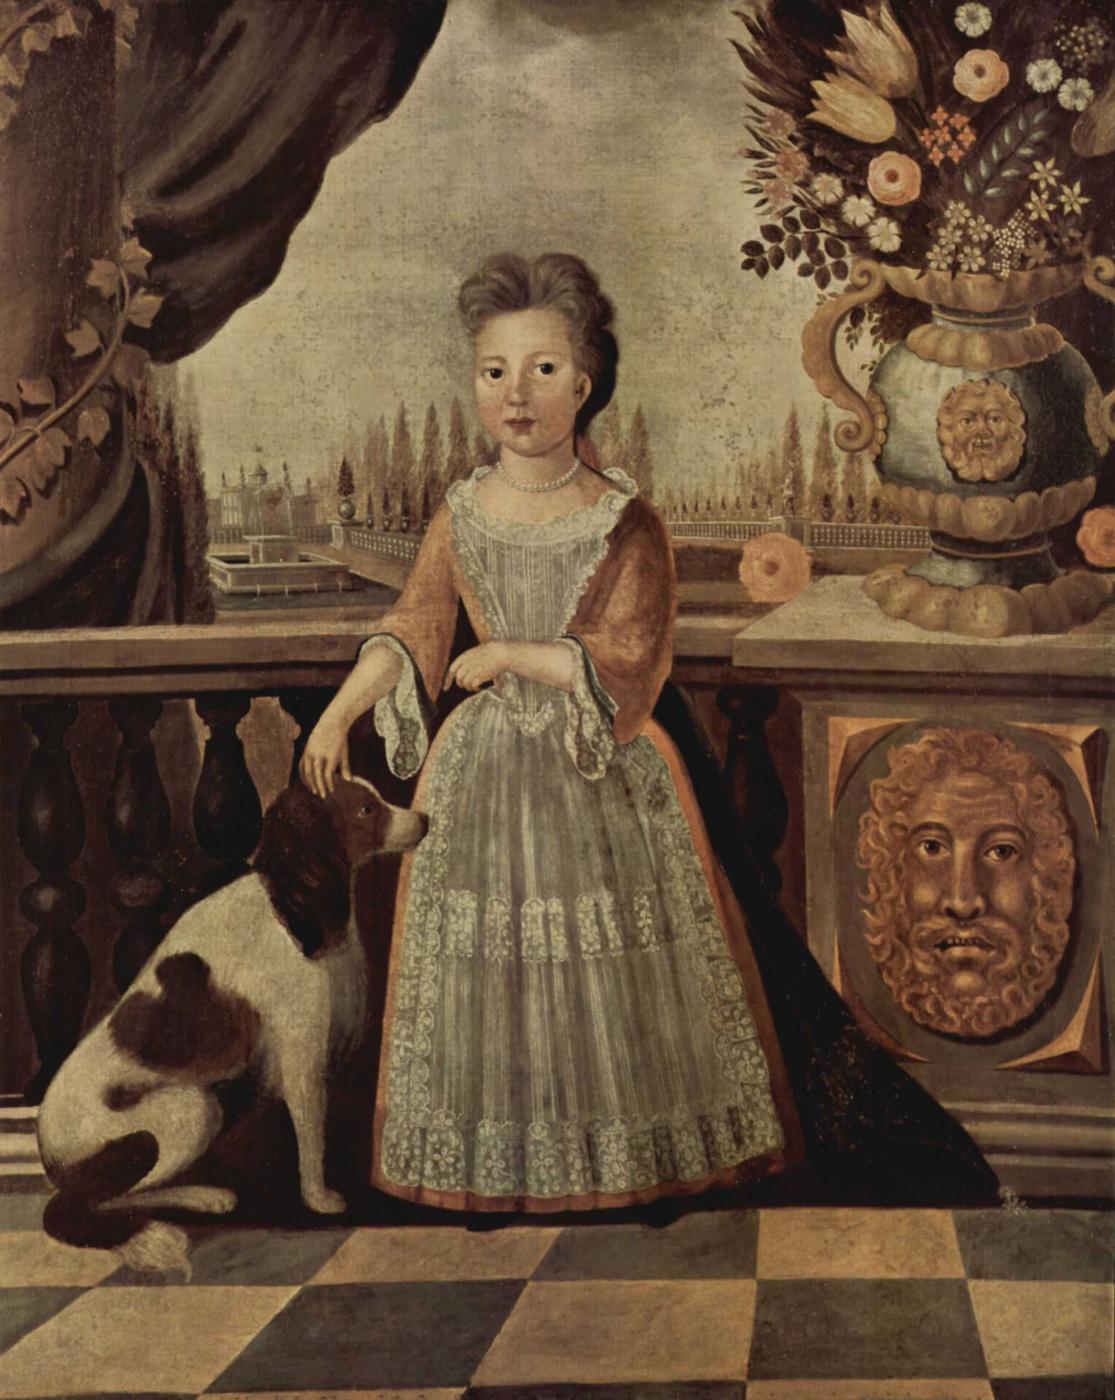 Justus Engelhardt Kyun. Portrait Of Eleonora, Darnall